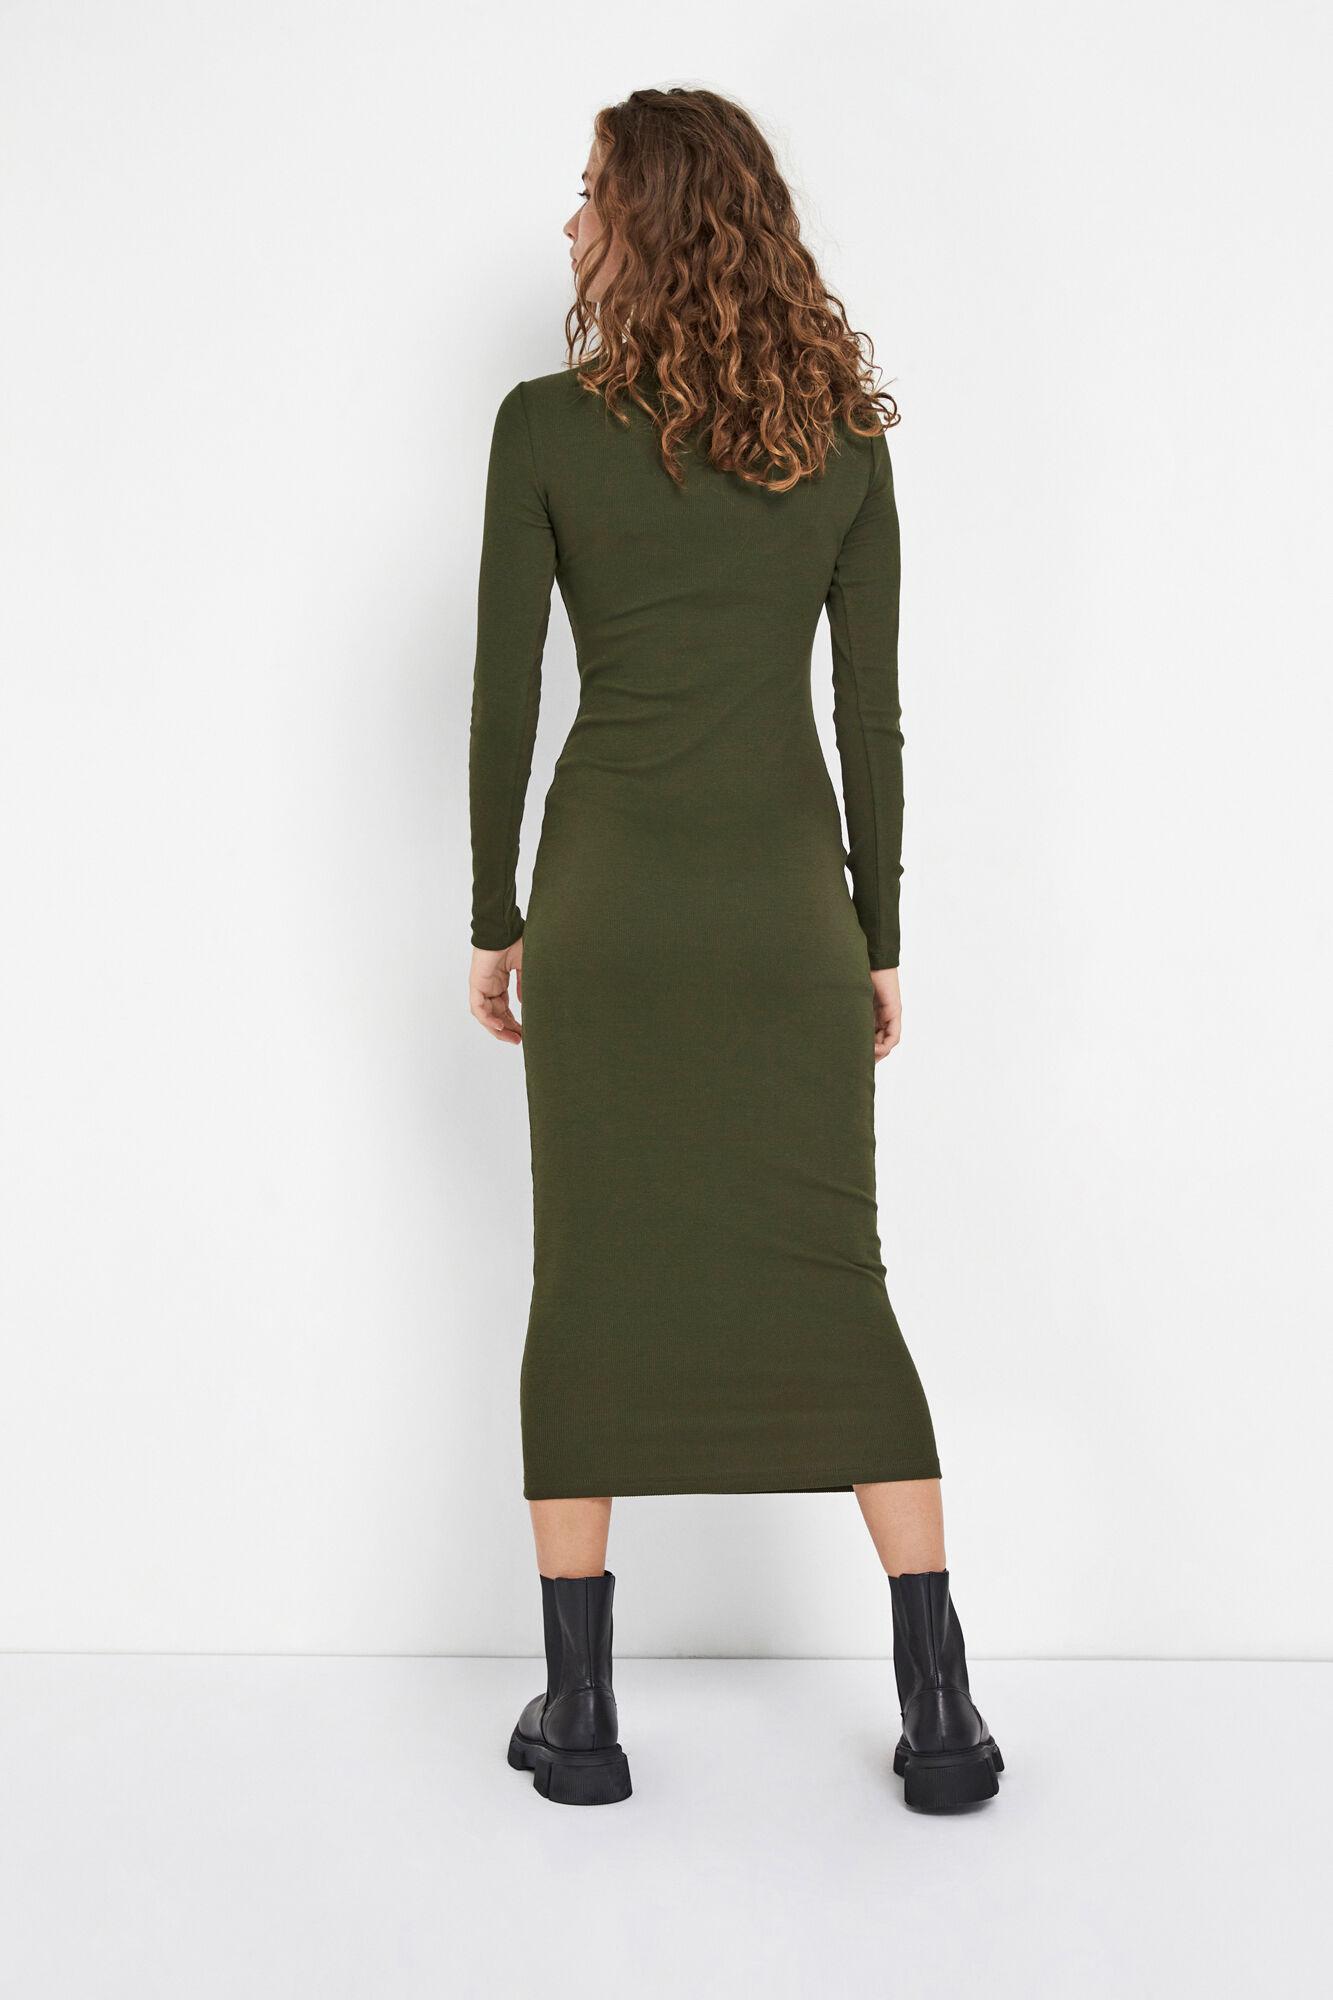 ENALLY LS DRESS 5314